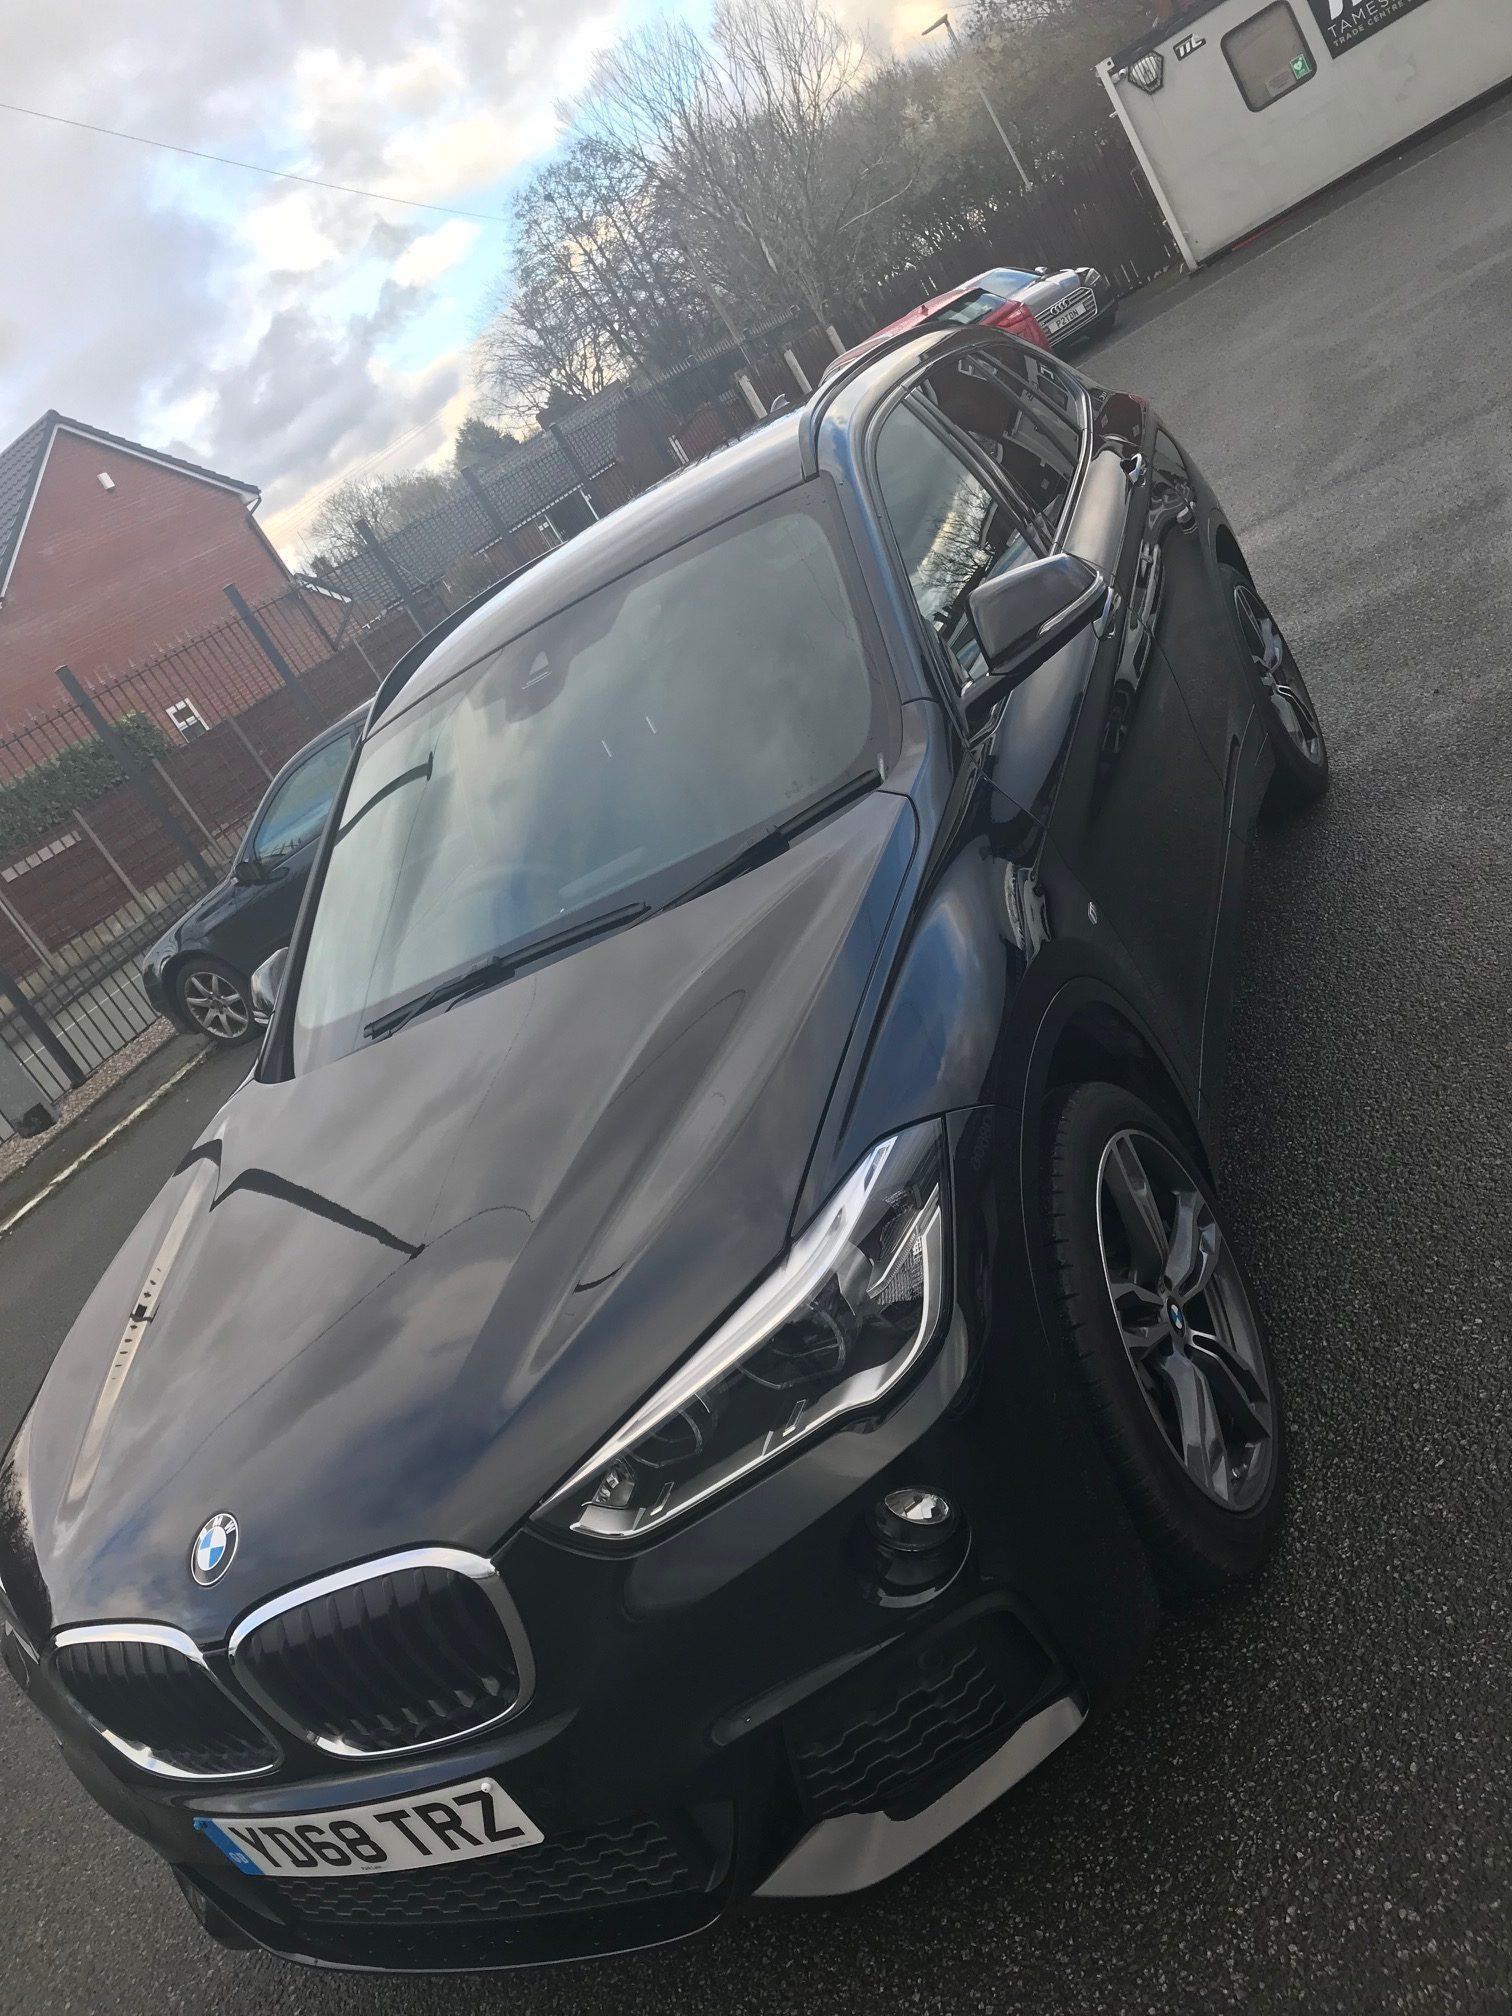 BMW X1 DIESEL ESTATE xDrive 20d M Sport 5dr Step Auto Car Leasing Select Options